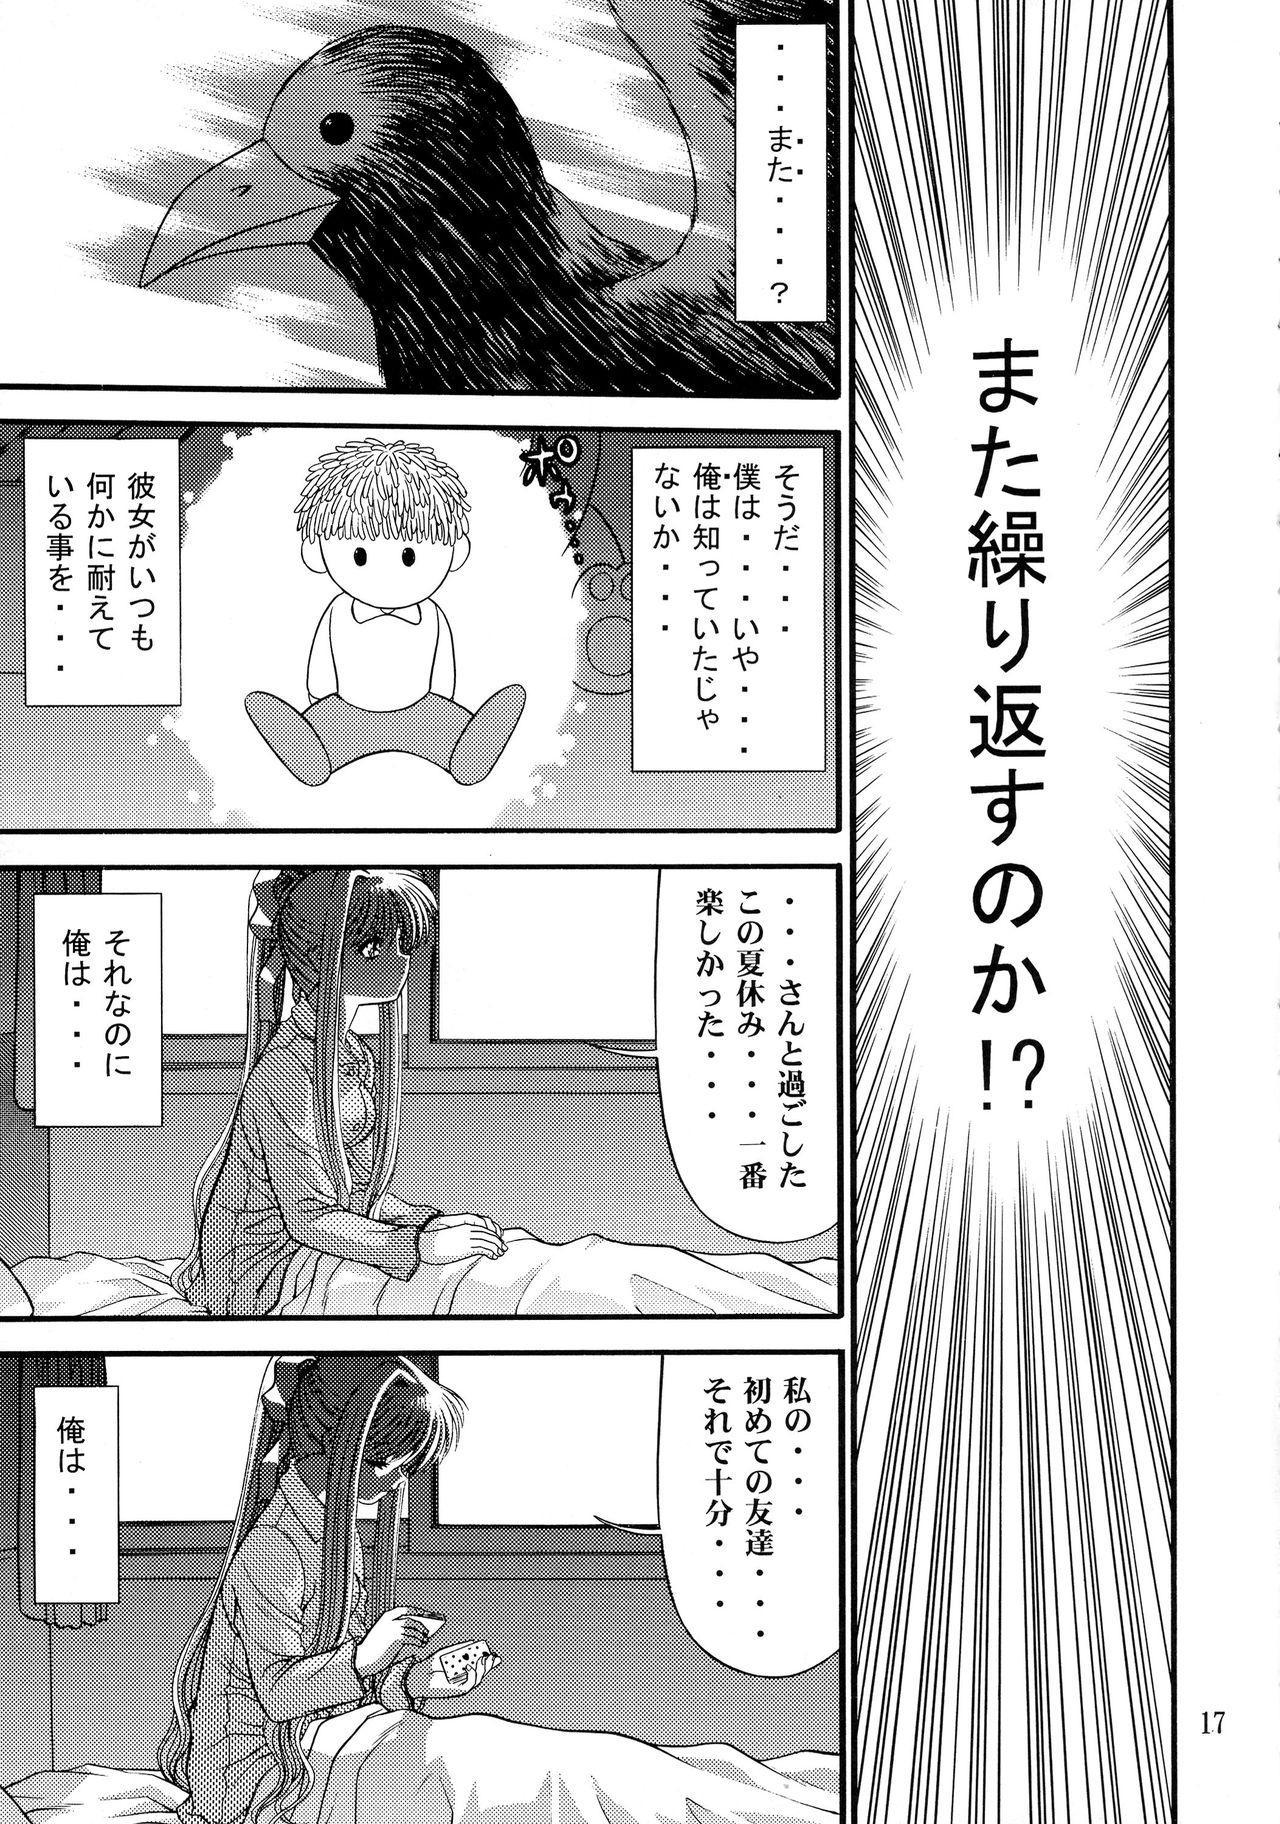 BLUE BLOOD'S Vol.9 15